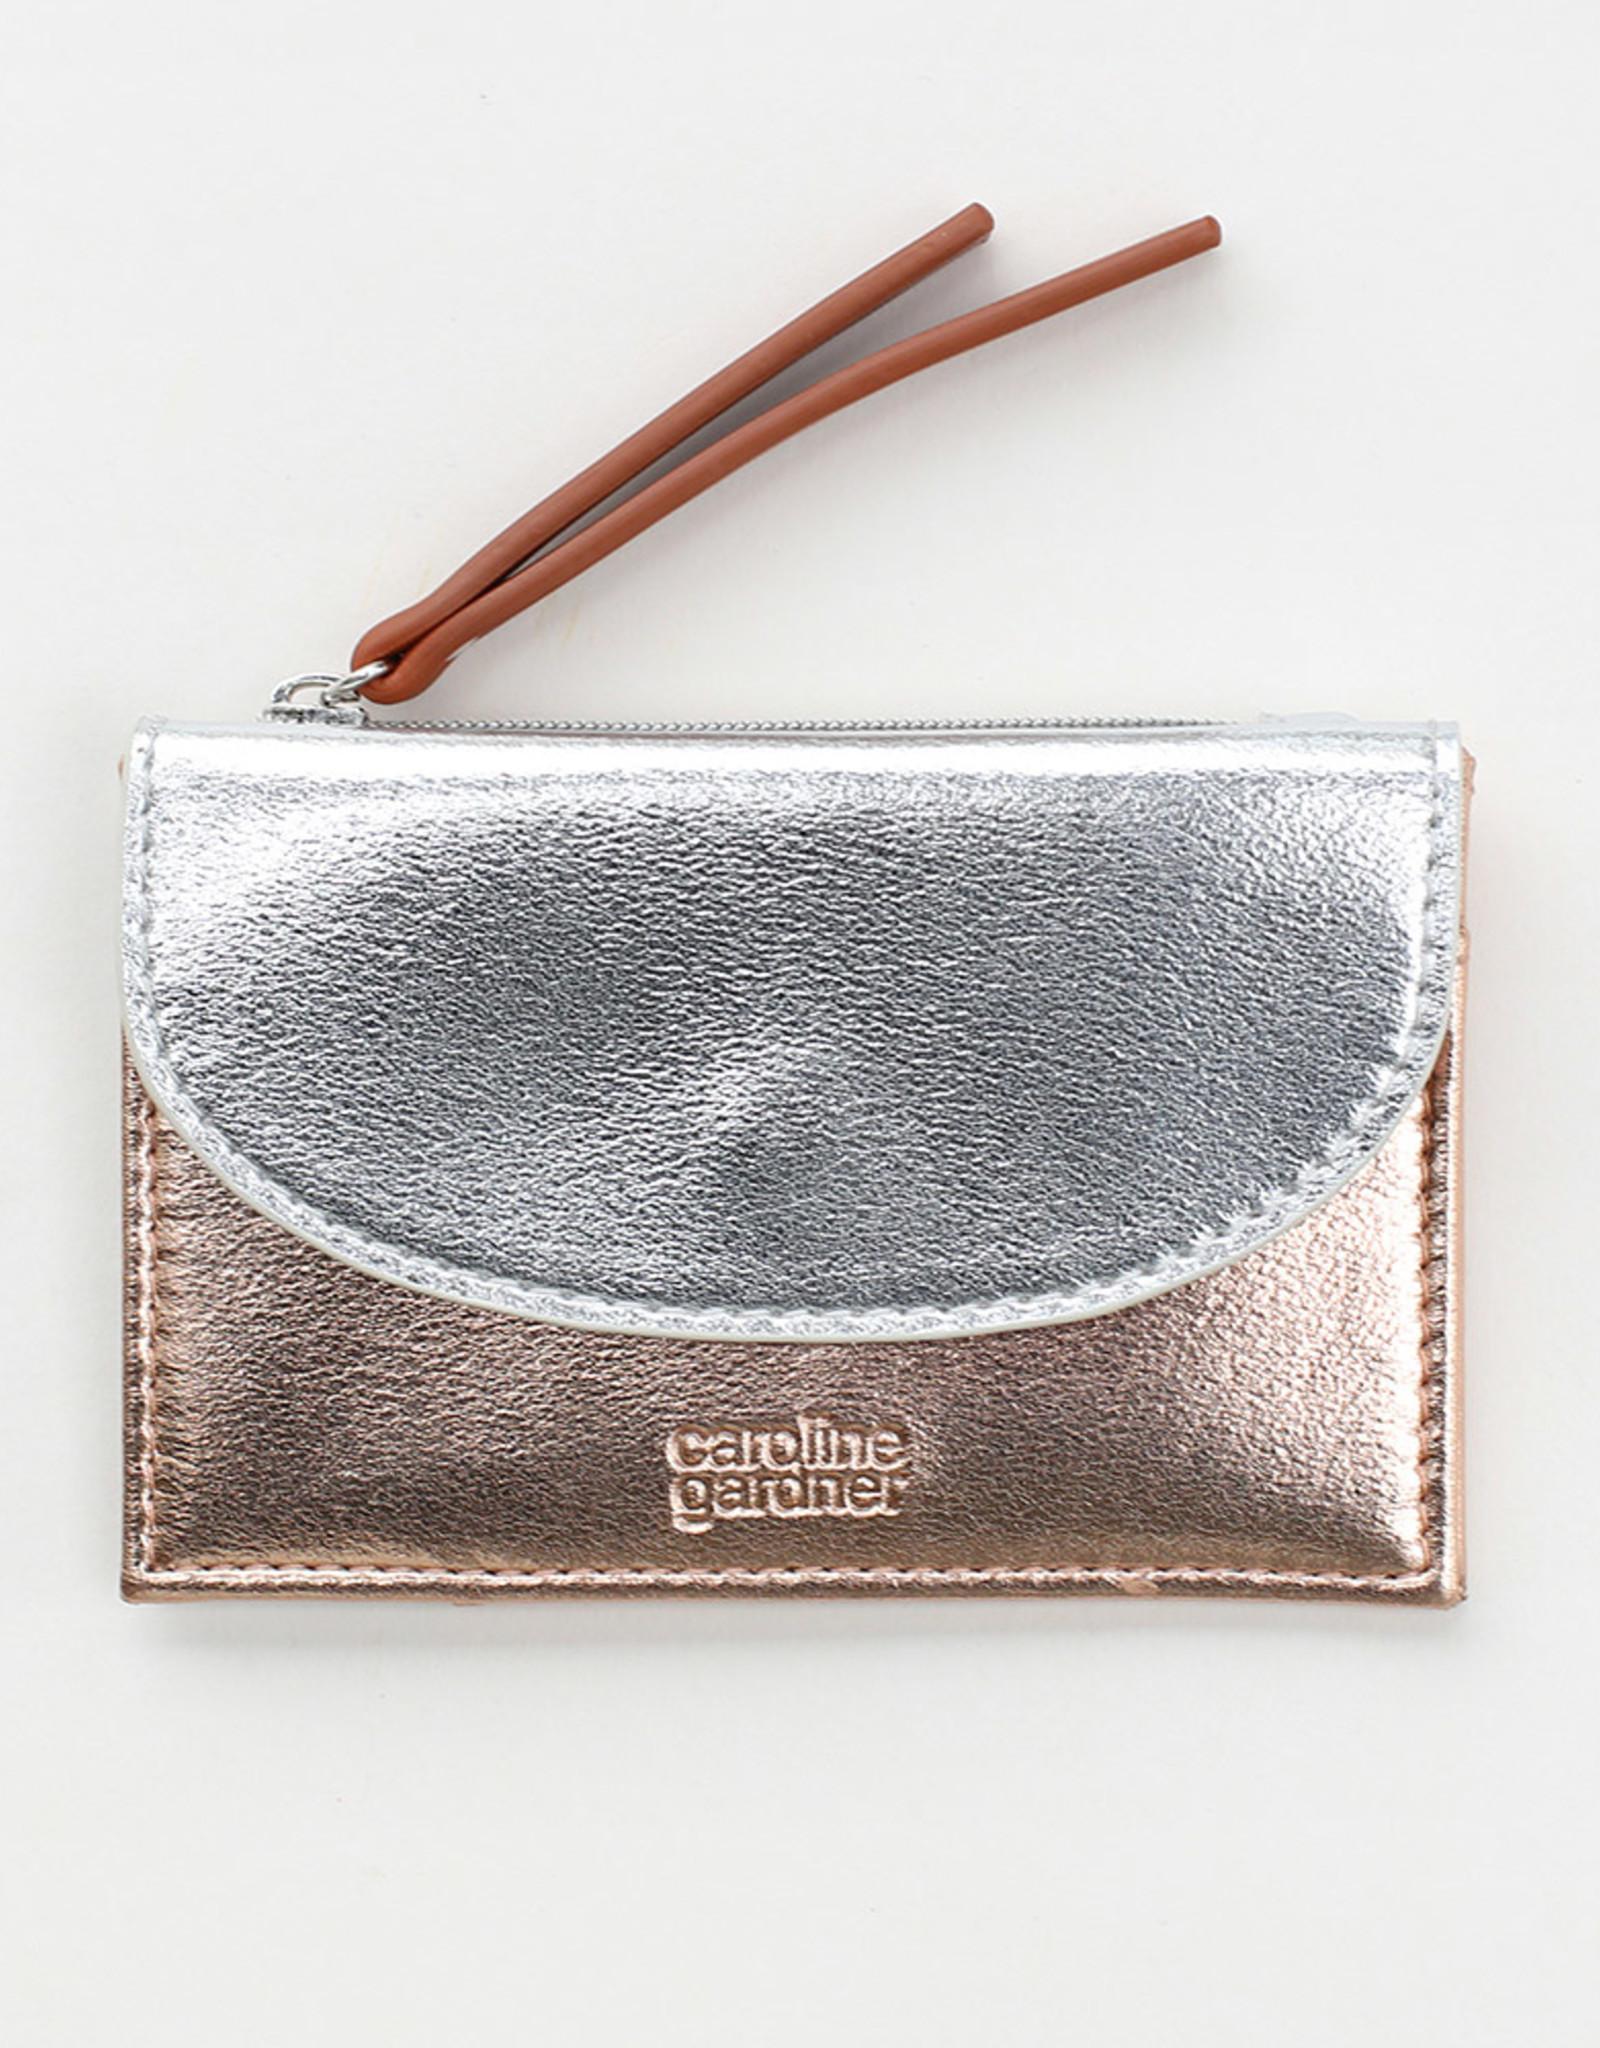 Caroline Gardener Wallet: Cardholder with coin purse